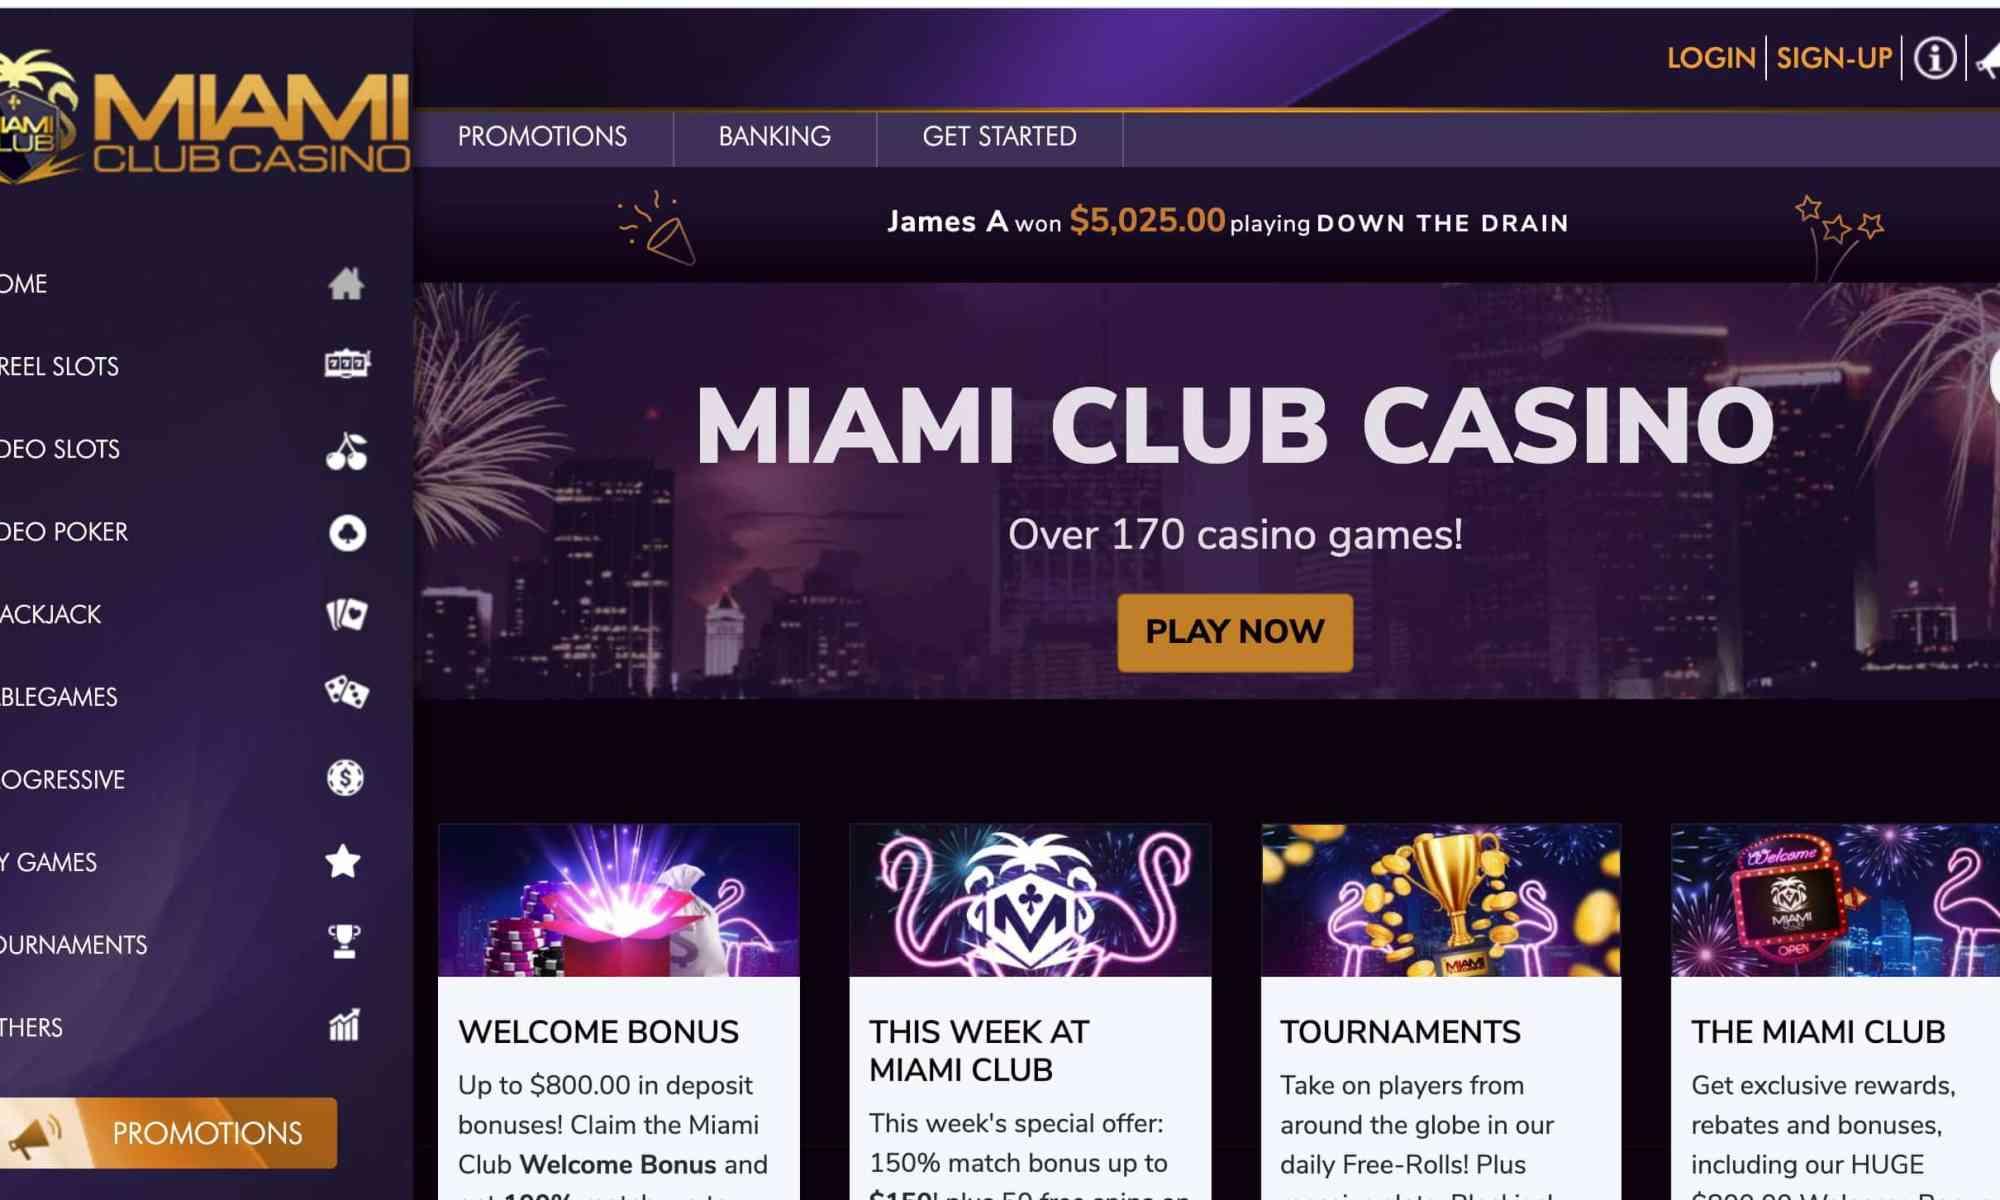 Miami Club Casino - Get 200% on 1st deposit plus $10 free